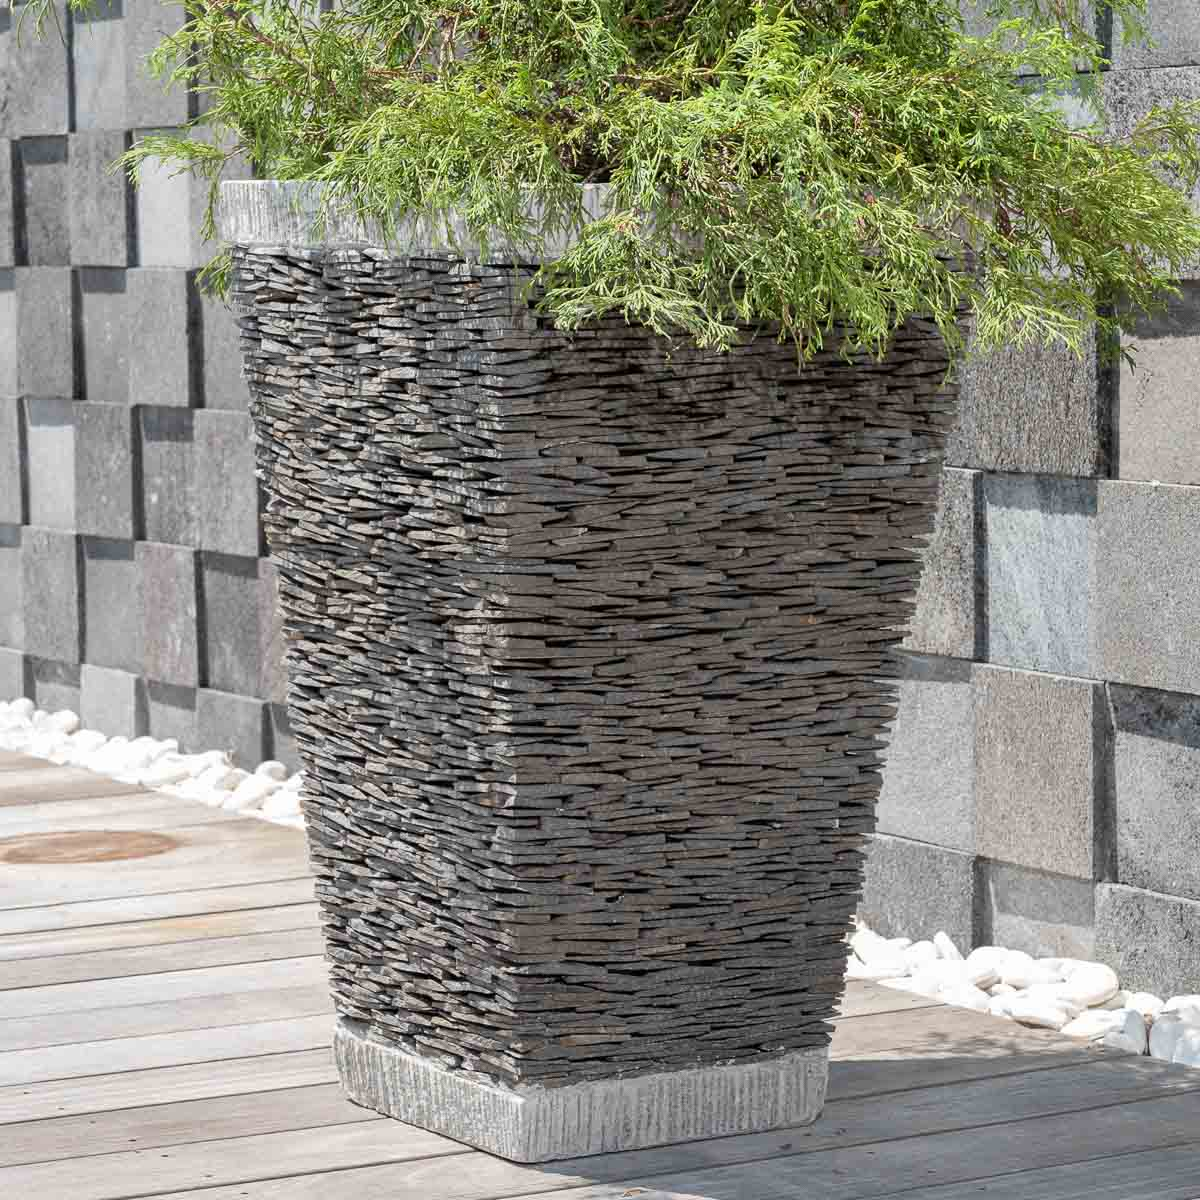 Maceta tiesto jardinera cuadrada pizarra 80cm piedra natural for Jardineras de piedra natural